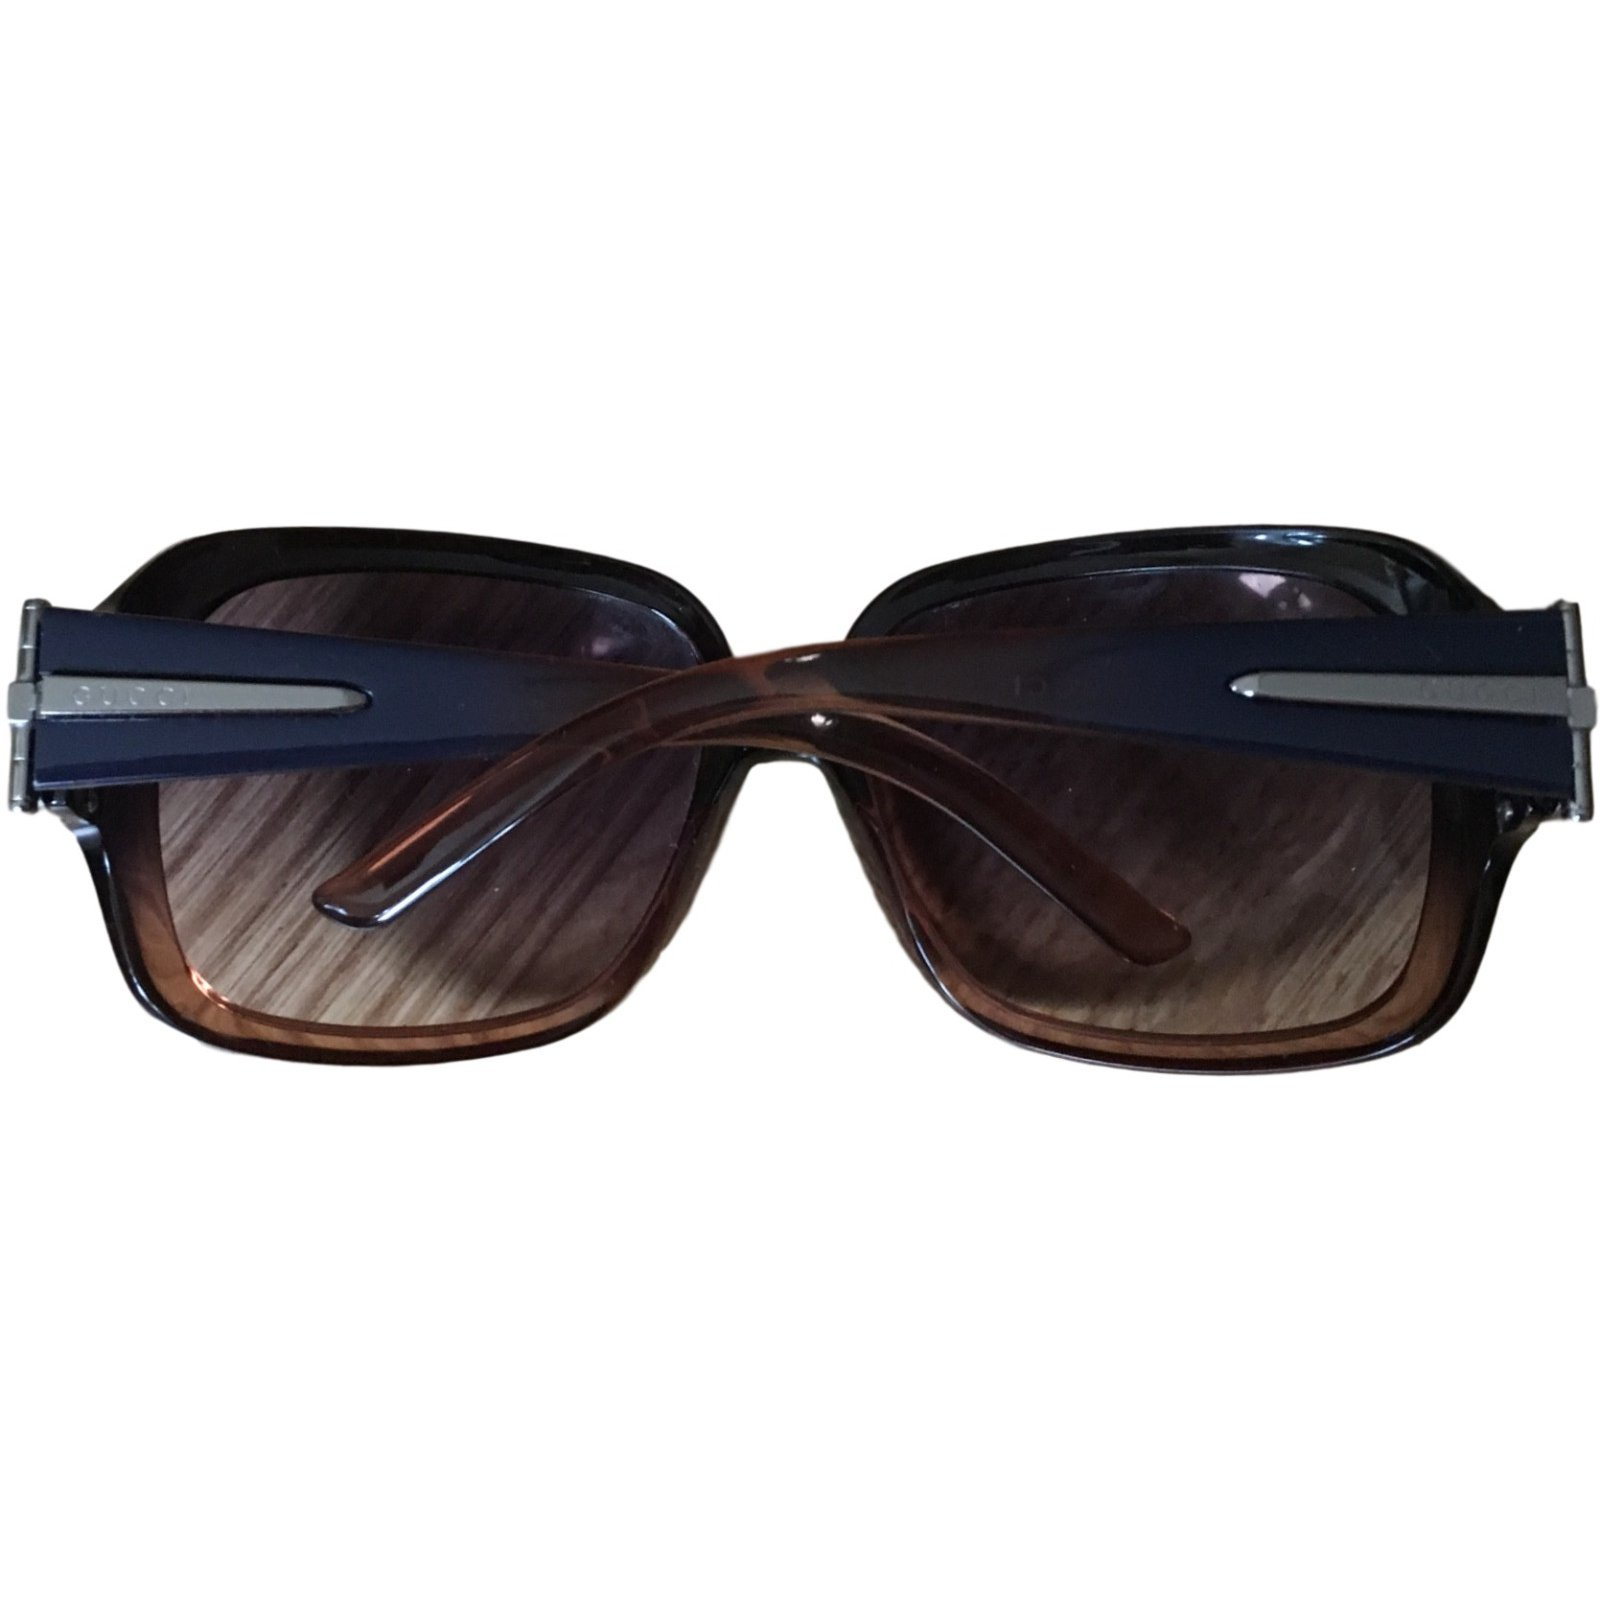 dc90993e67c Gucci Sunglasses Sunglasses Plastic Blue ref.39163 - Joli Closet